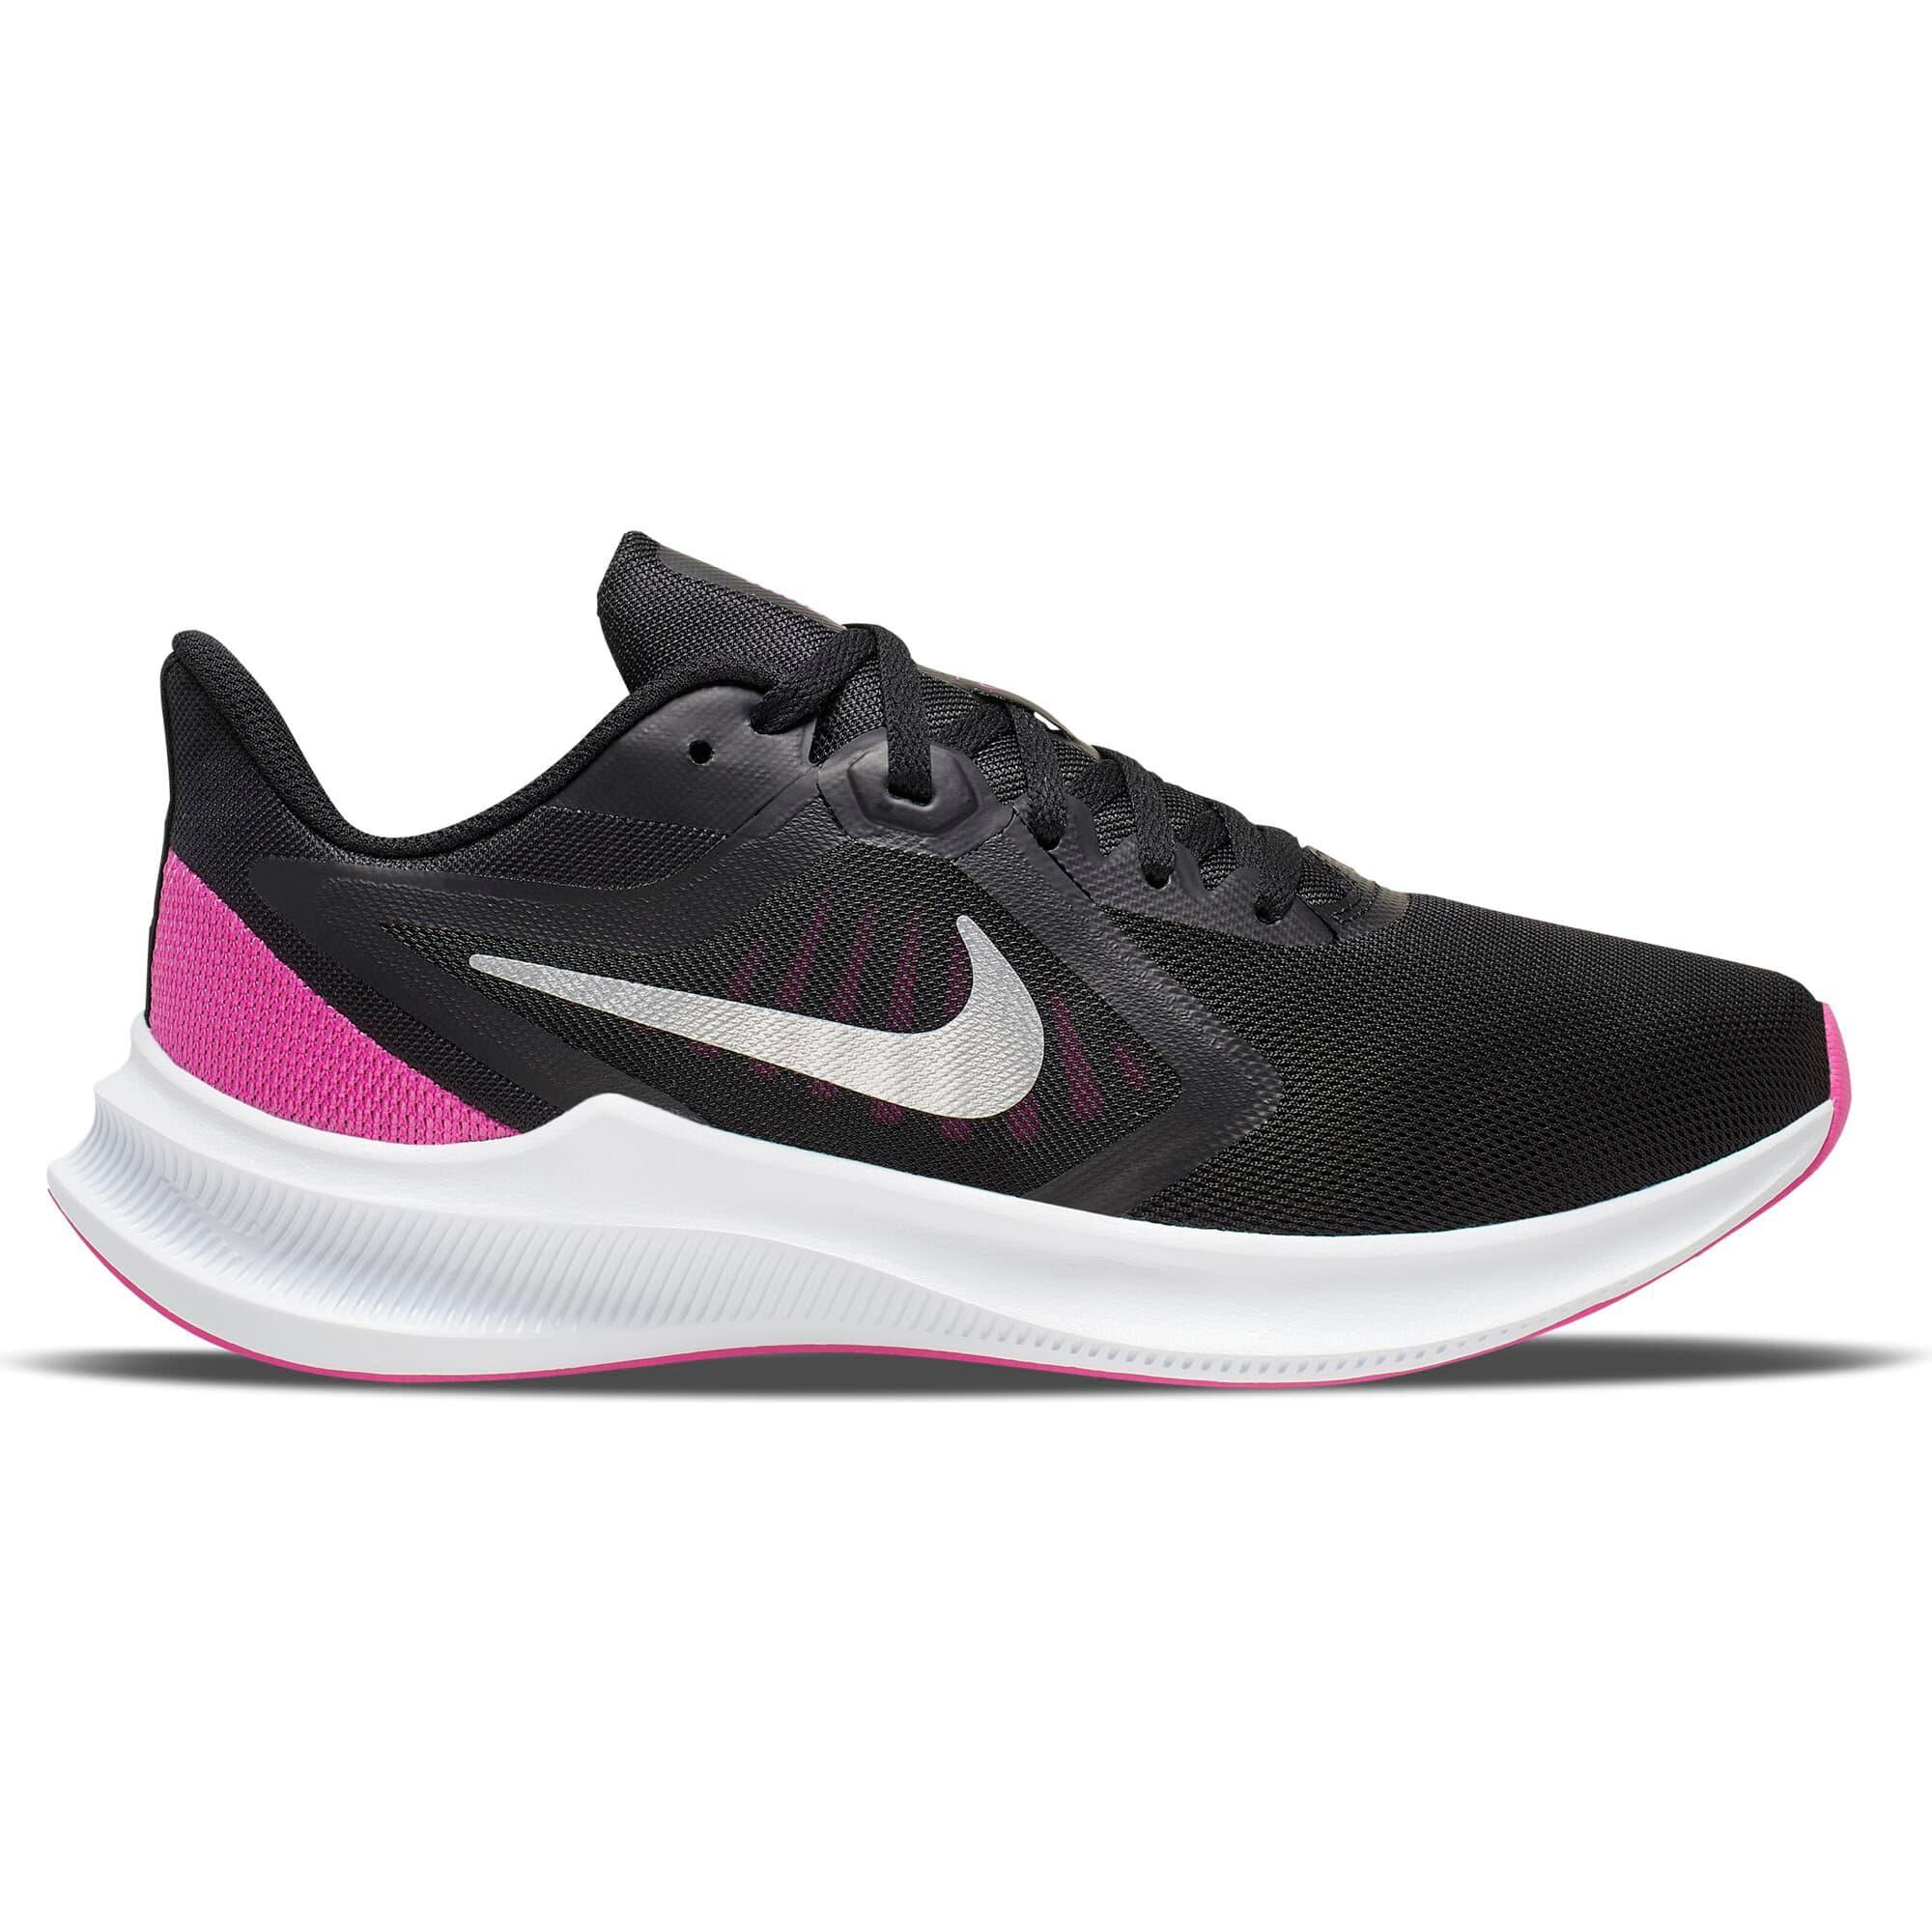 Nike Downshifter 10 Damen-Freizeitschuh